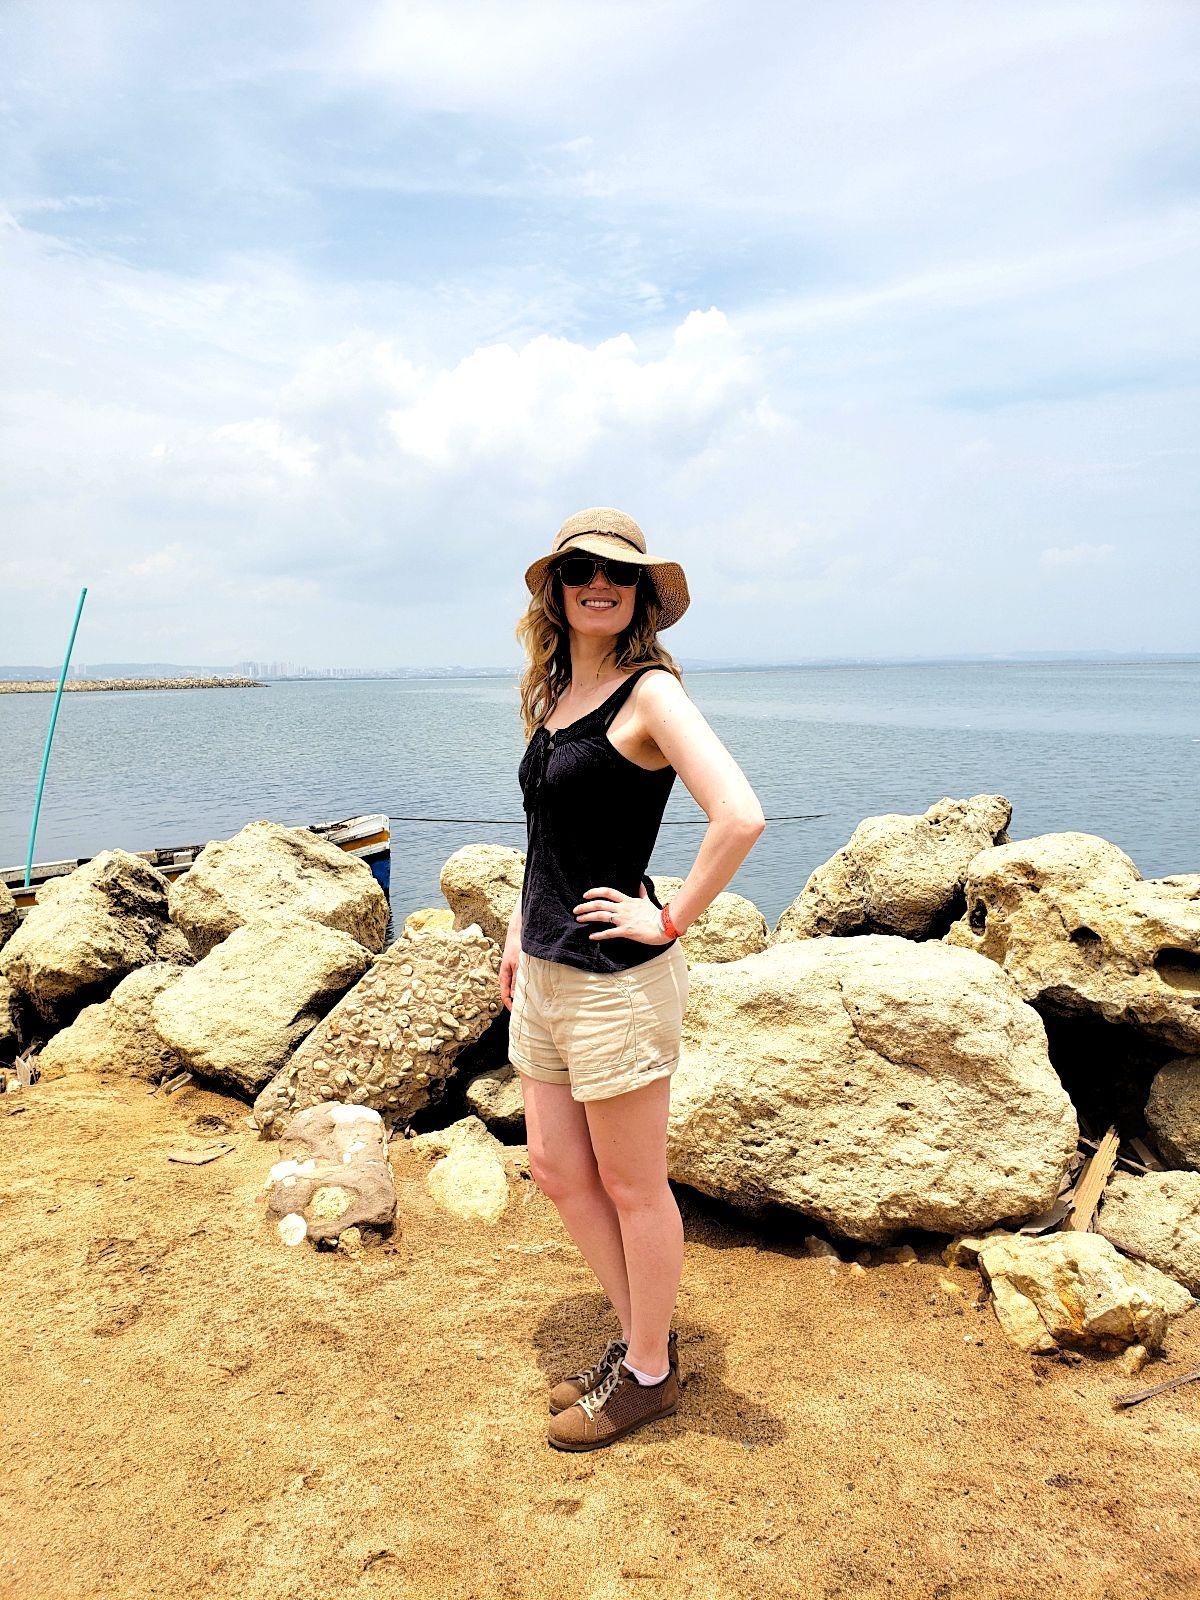 Ik in Barranquilla